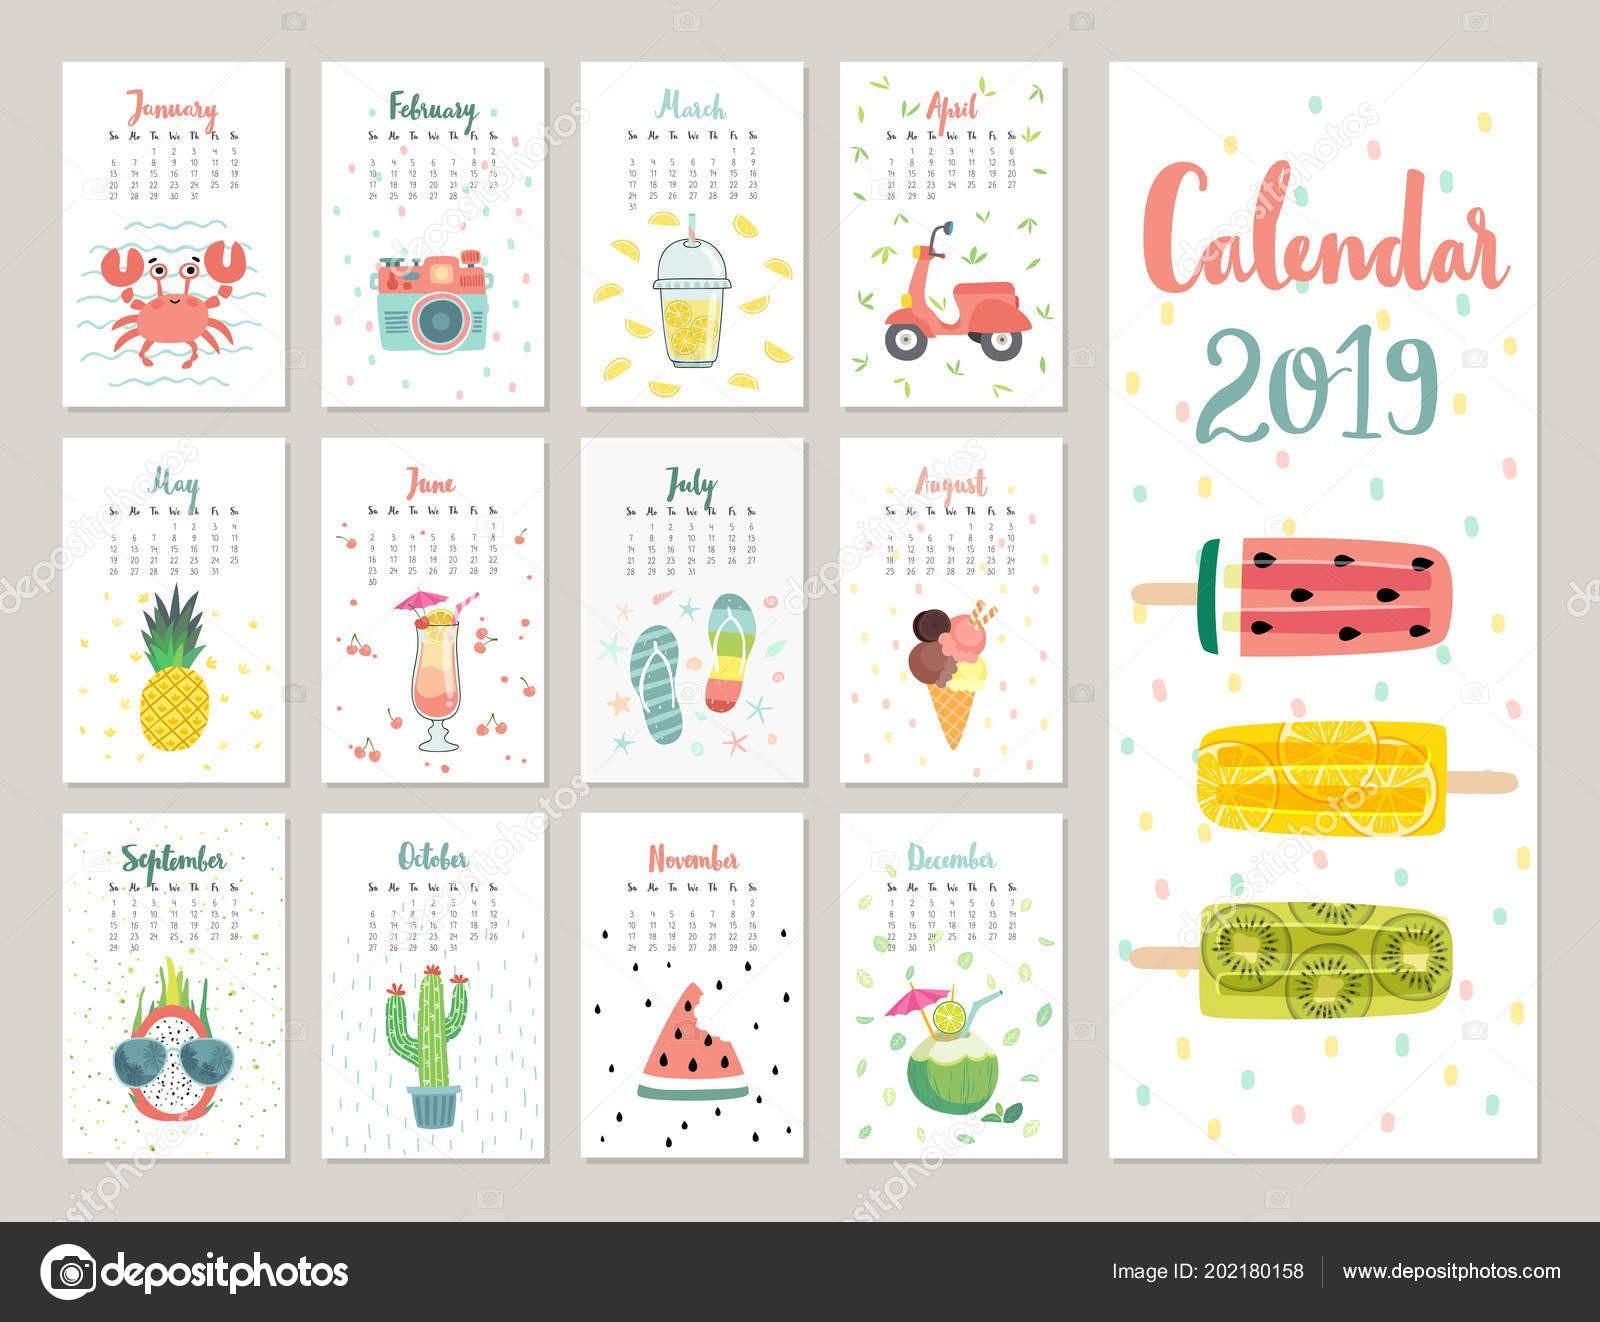 Calendario 2019 Calendario Mensile Carino Con Lifestyle Og ti Frutti Piante — Vettoriale Stock